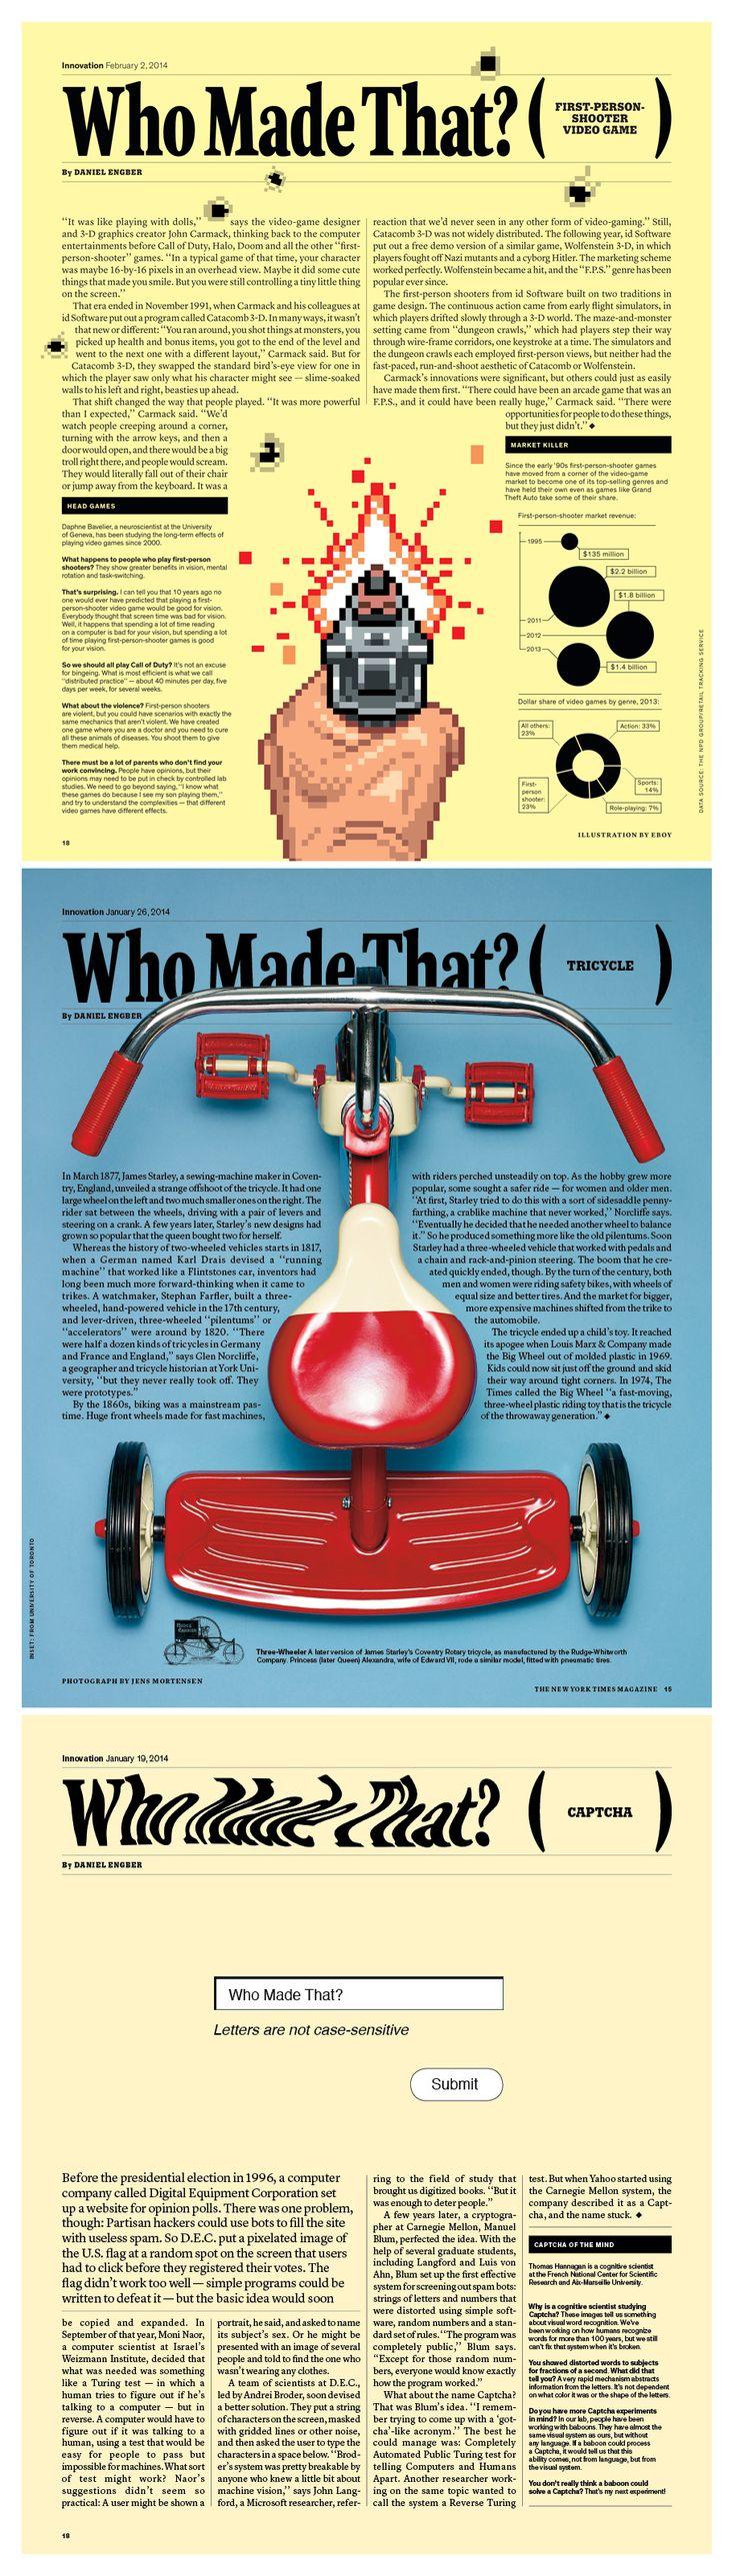 The New York Times Magazine: Design Raul Aguila, Design Director Arem Duplessis #magazine #layout